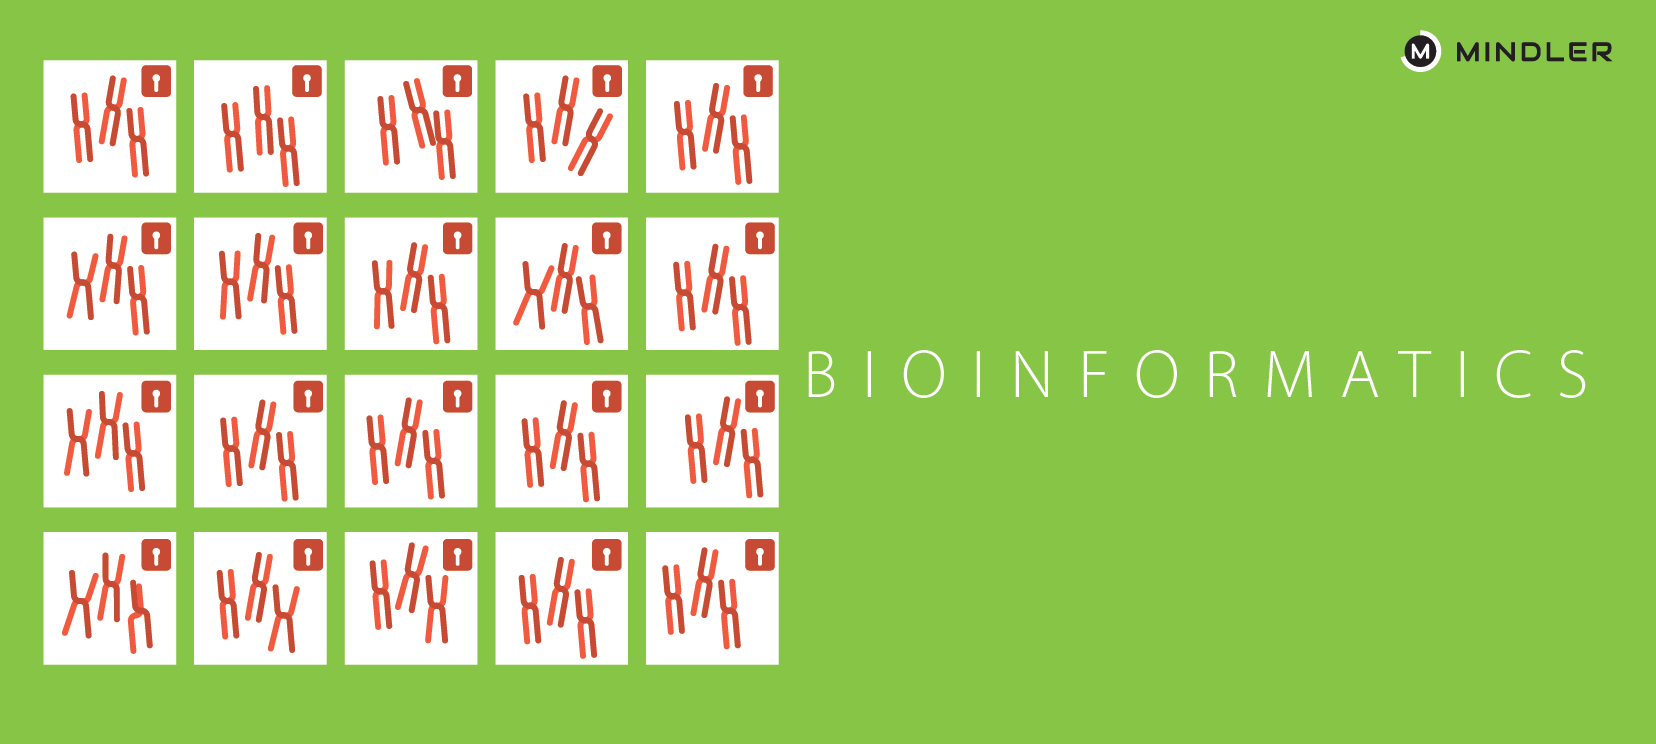 bioinformatics-career-in-india